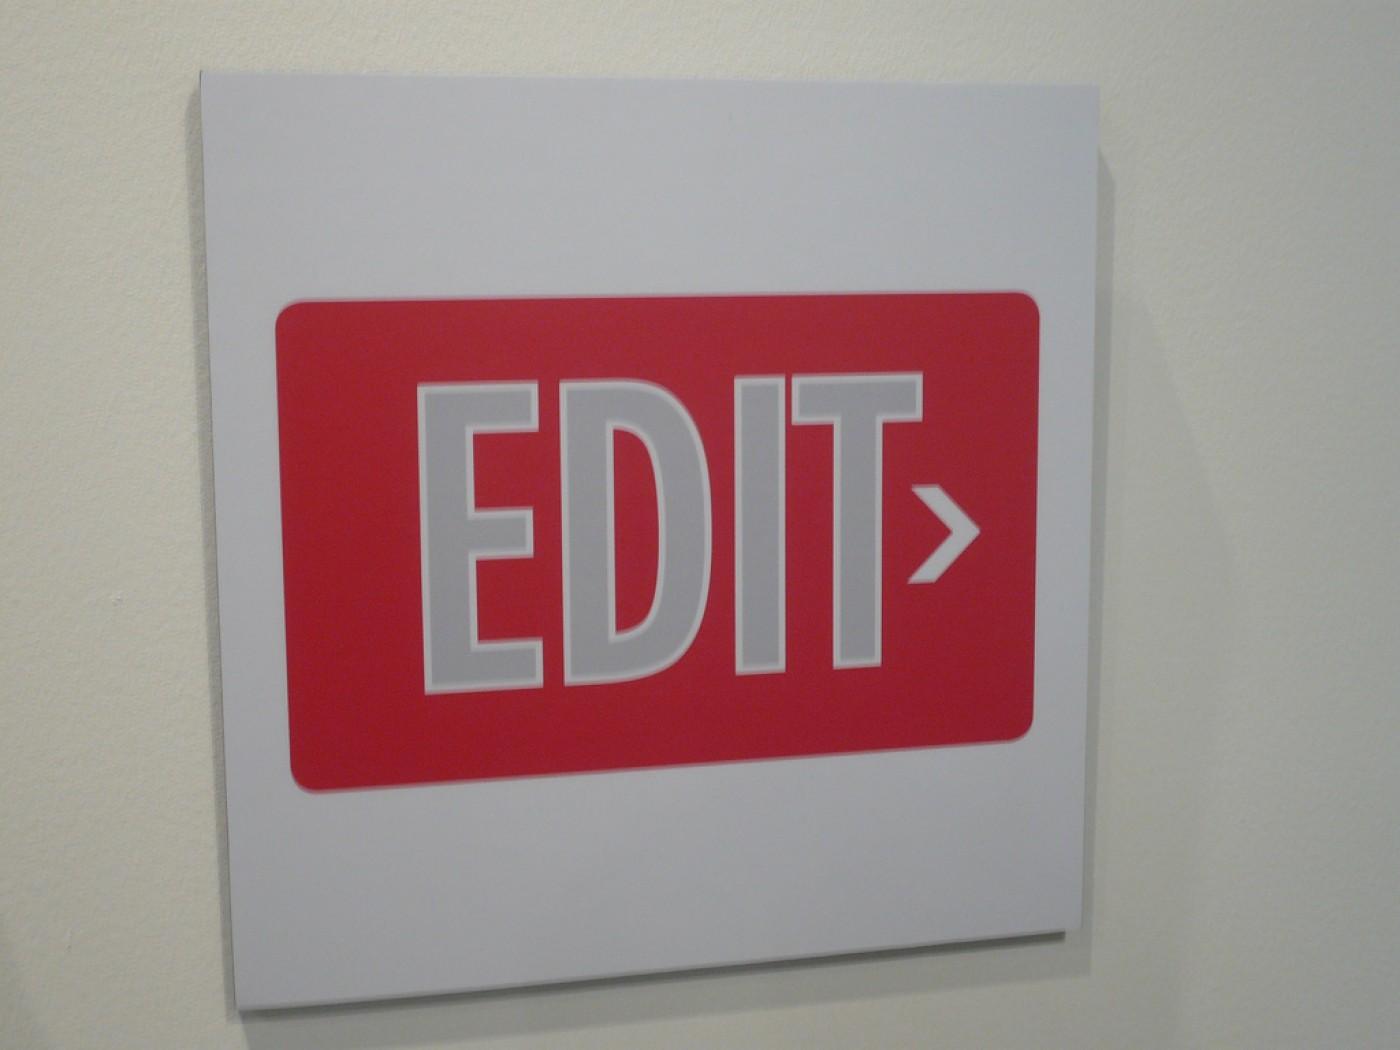 018 Edit Essay Example College Word Impressive Limit Apply Texas 2019 1400